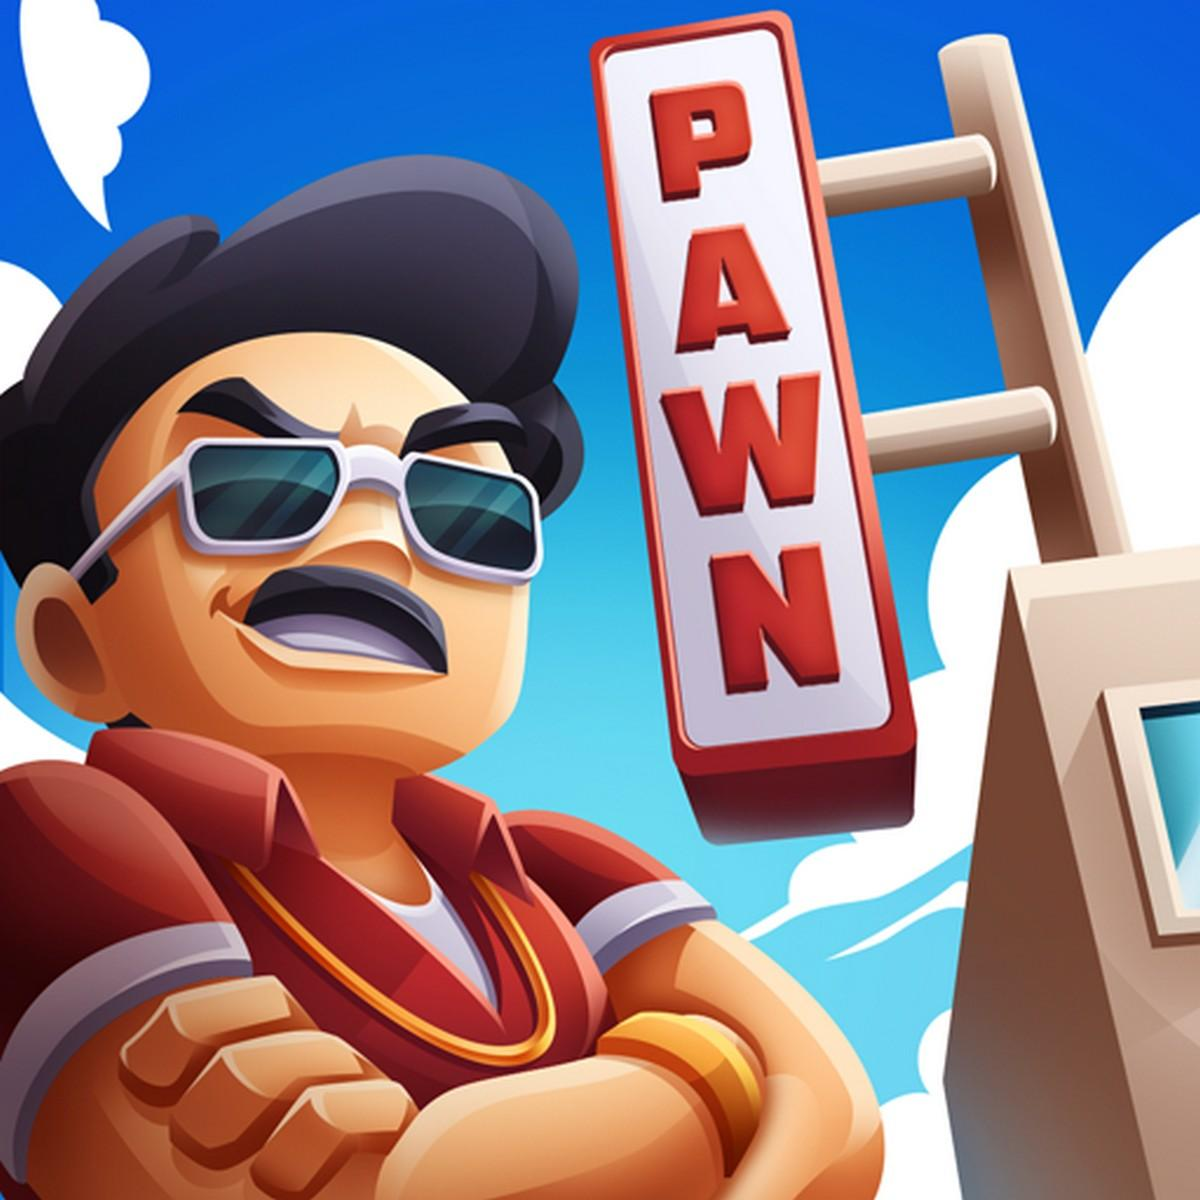 Pawn Shop Master APK MOD